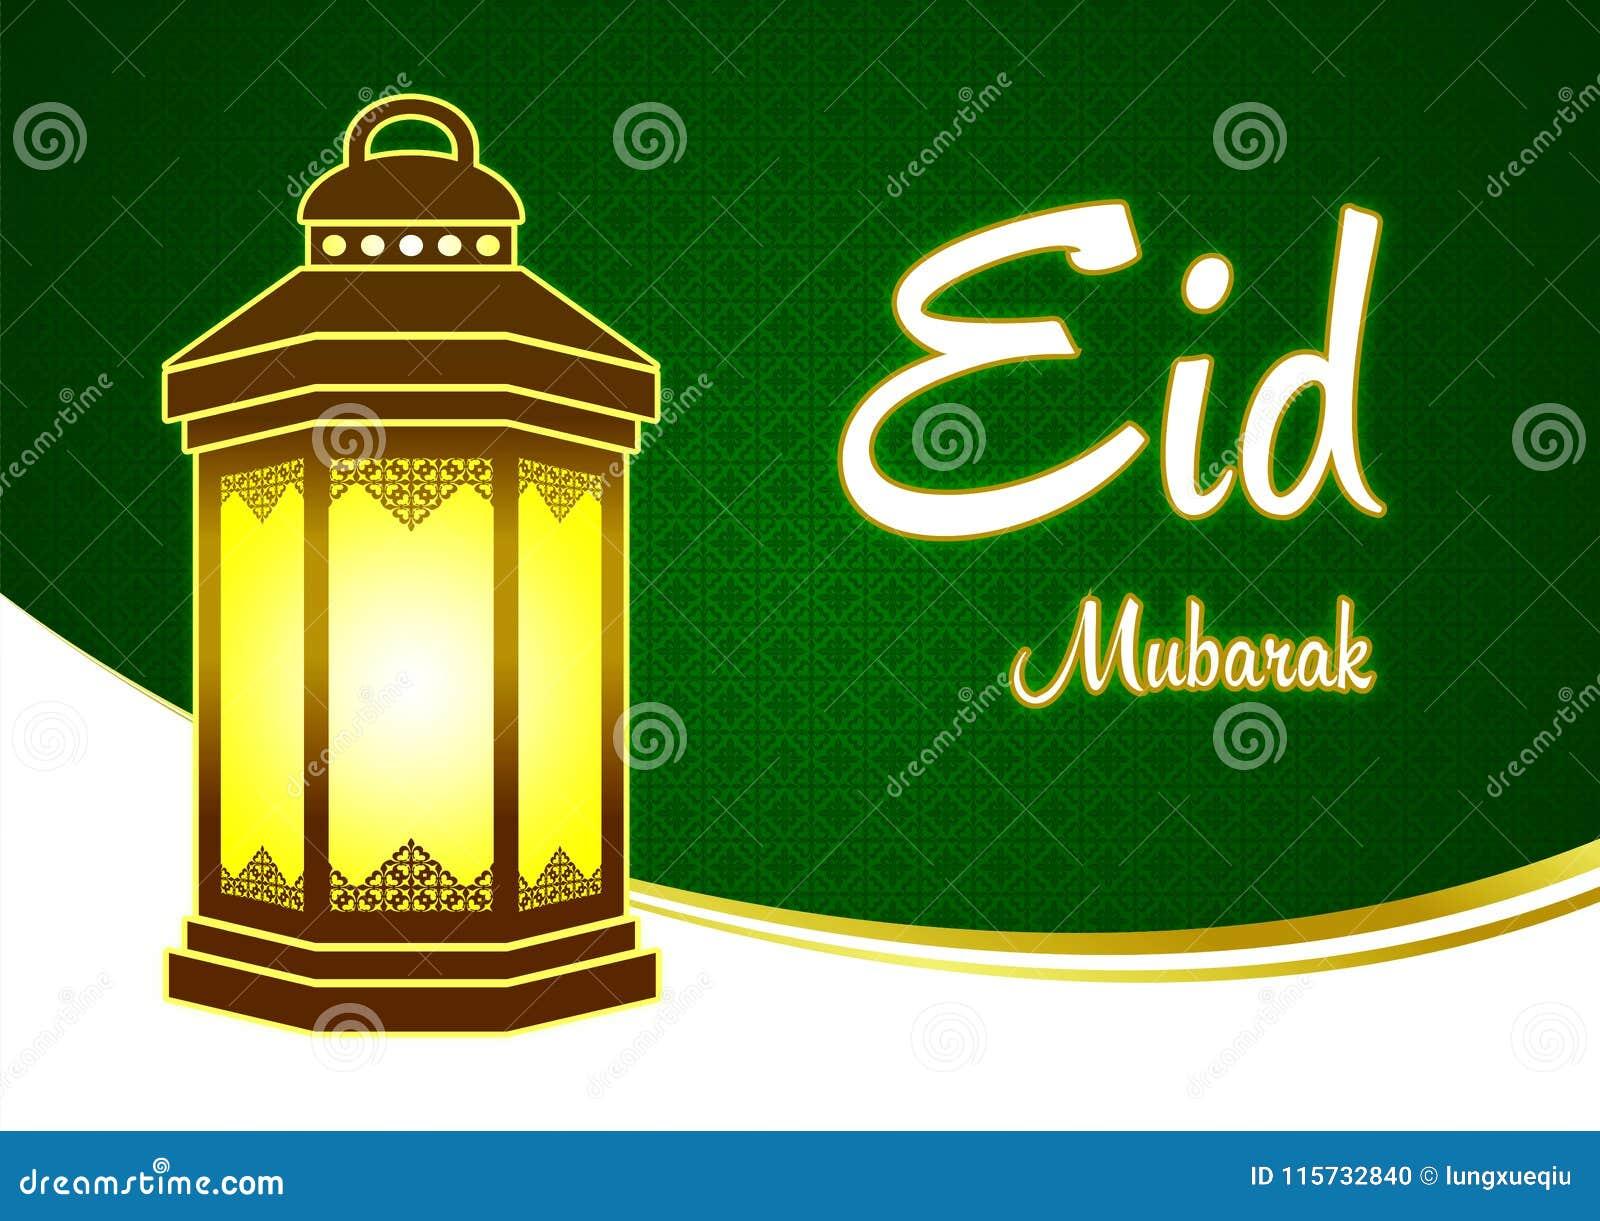 Eid mubarak and ramadan green greeting card with lantern stock eid mubarak and ramadan green greeting card with lantern m4hsunfo